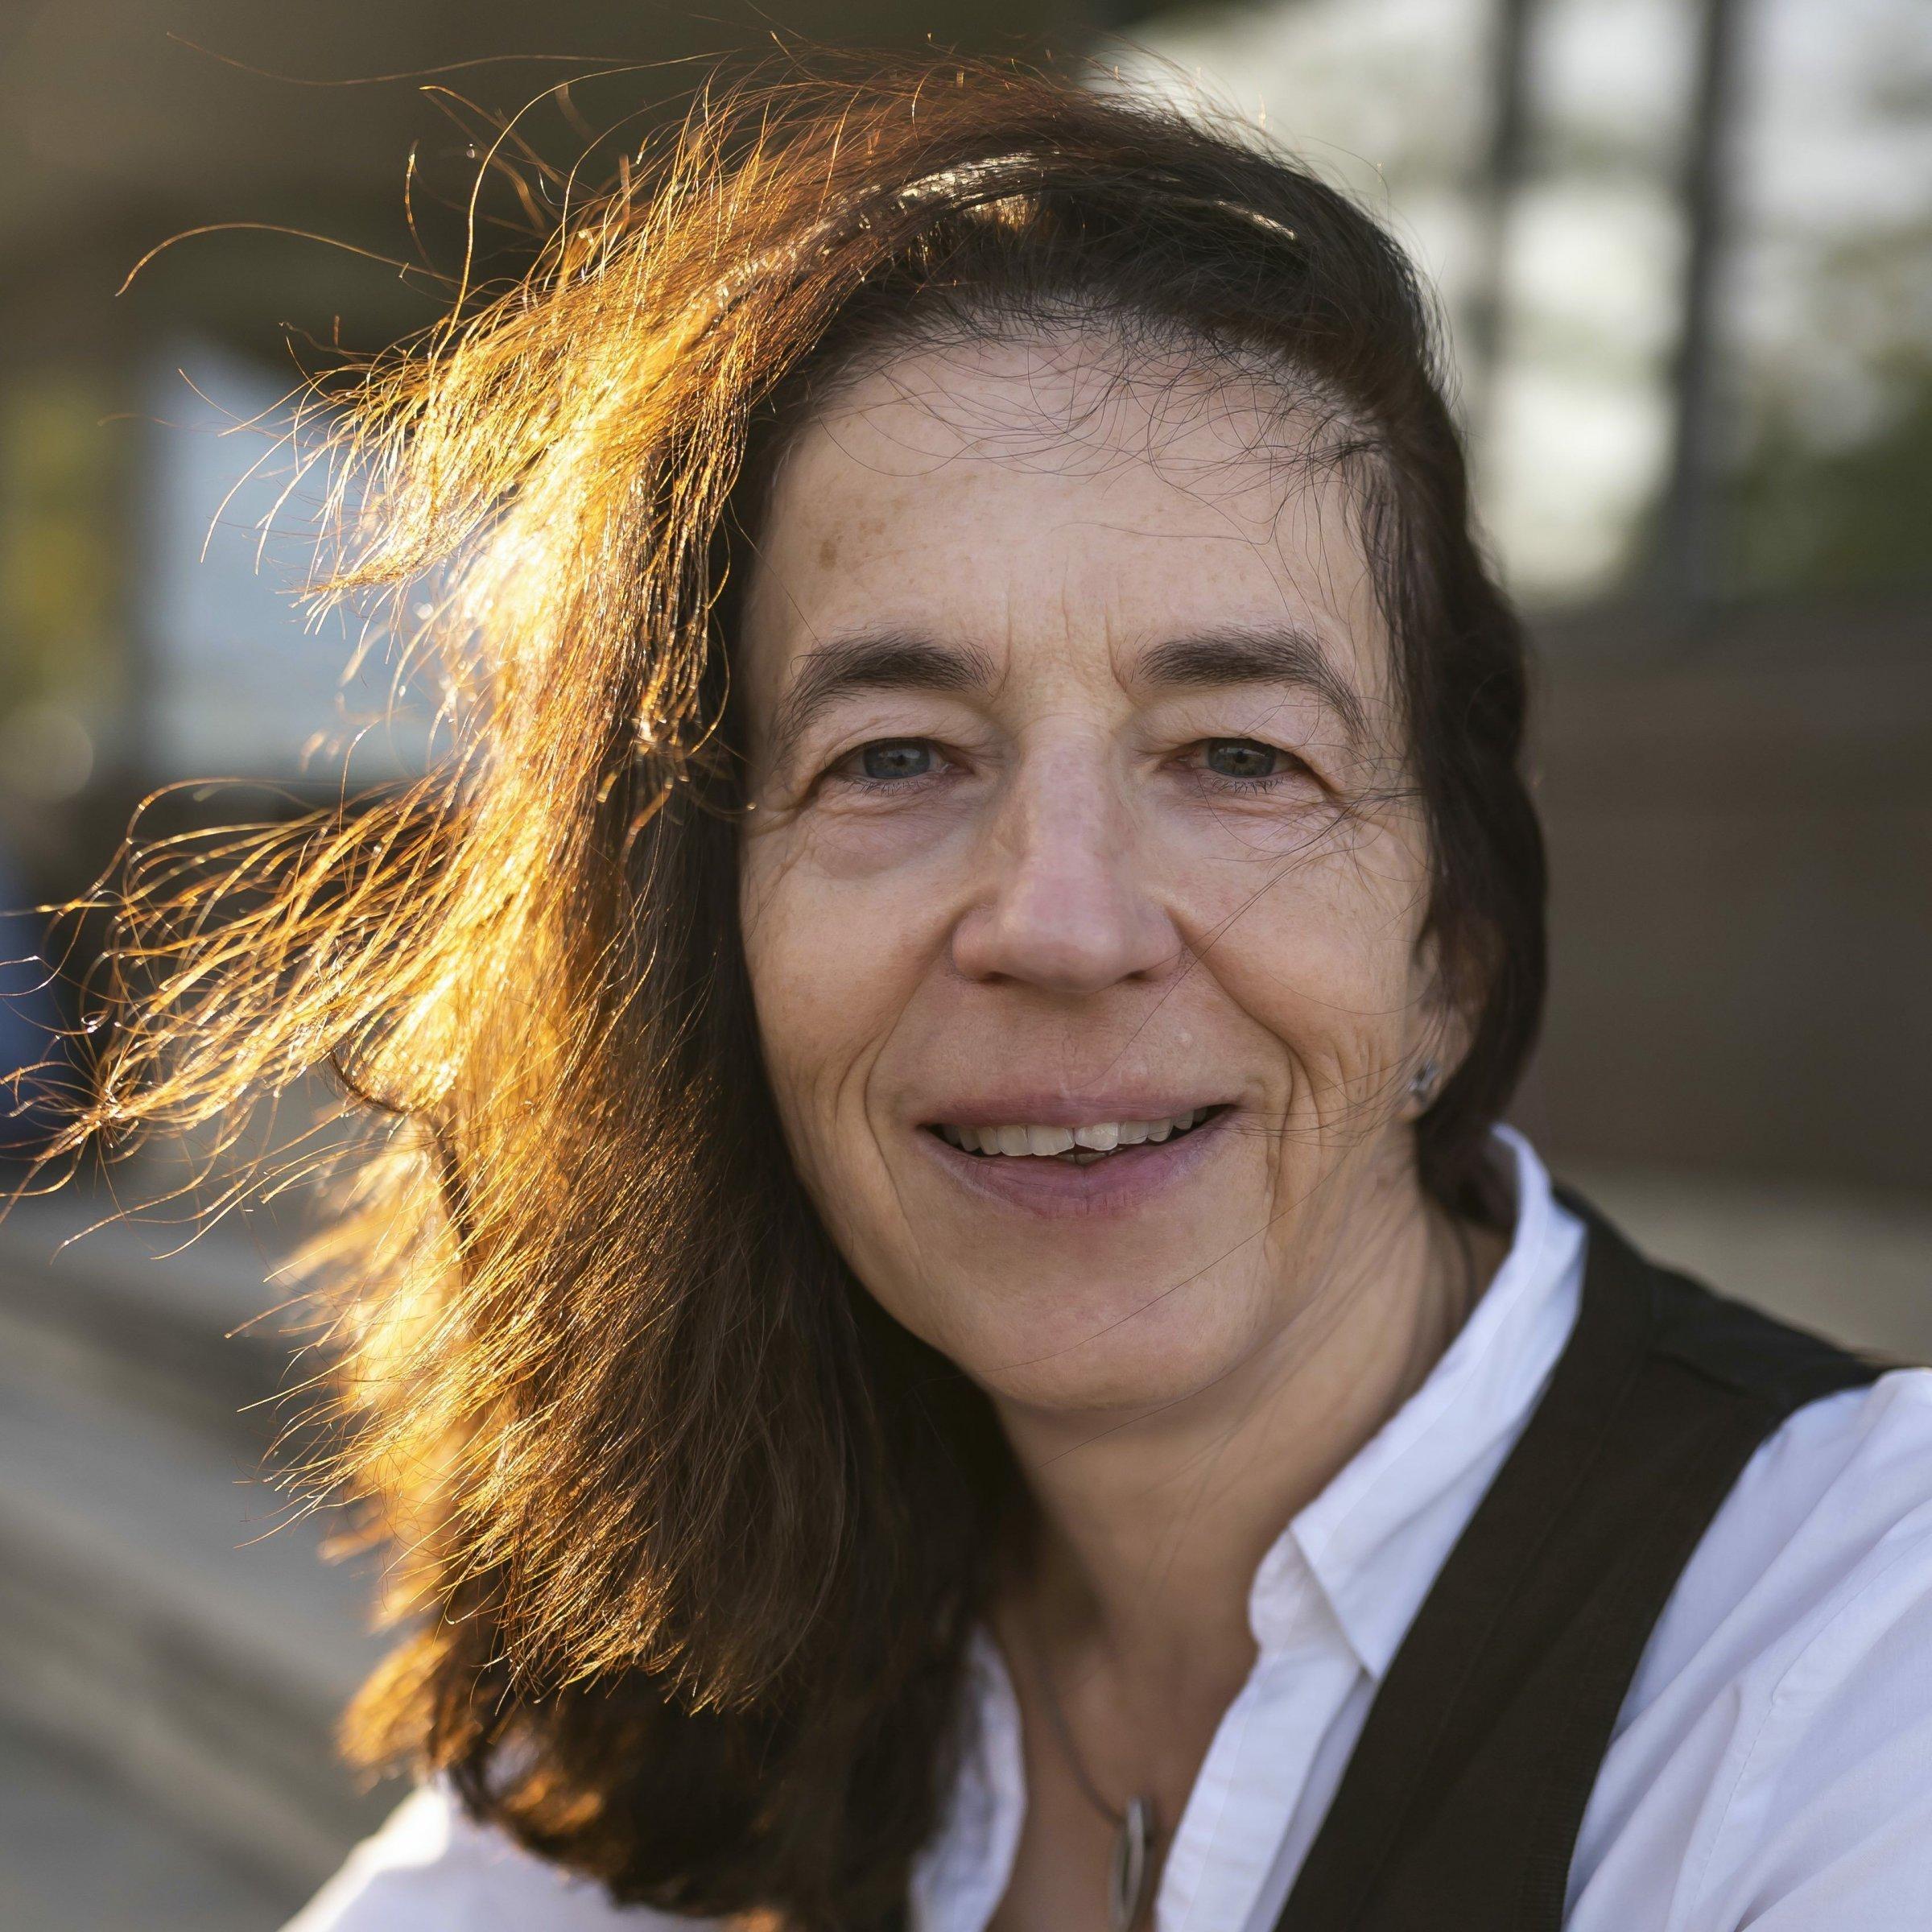 Portraitfoto Claudia Ruby